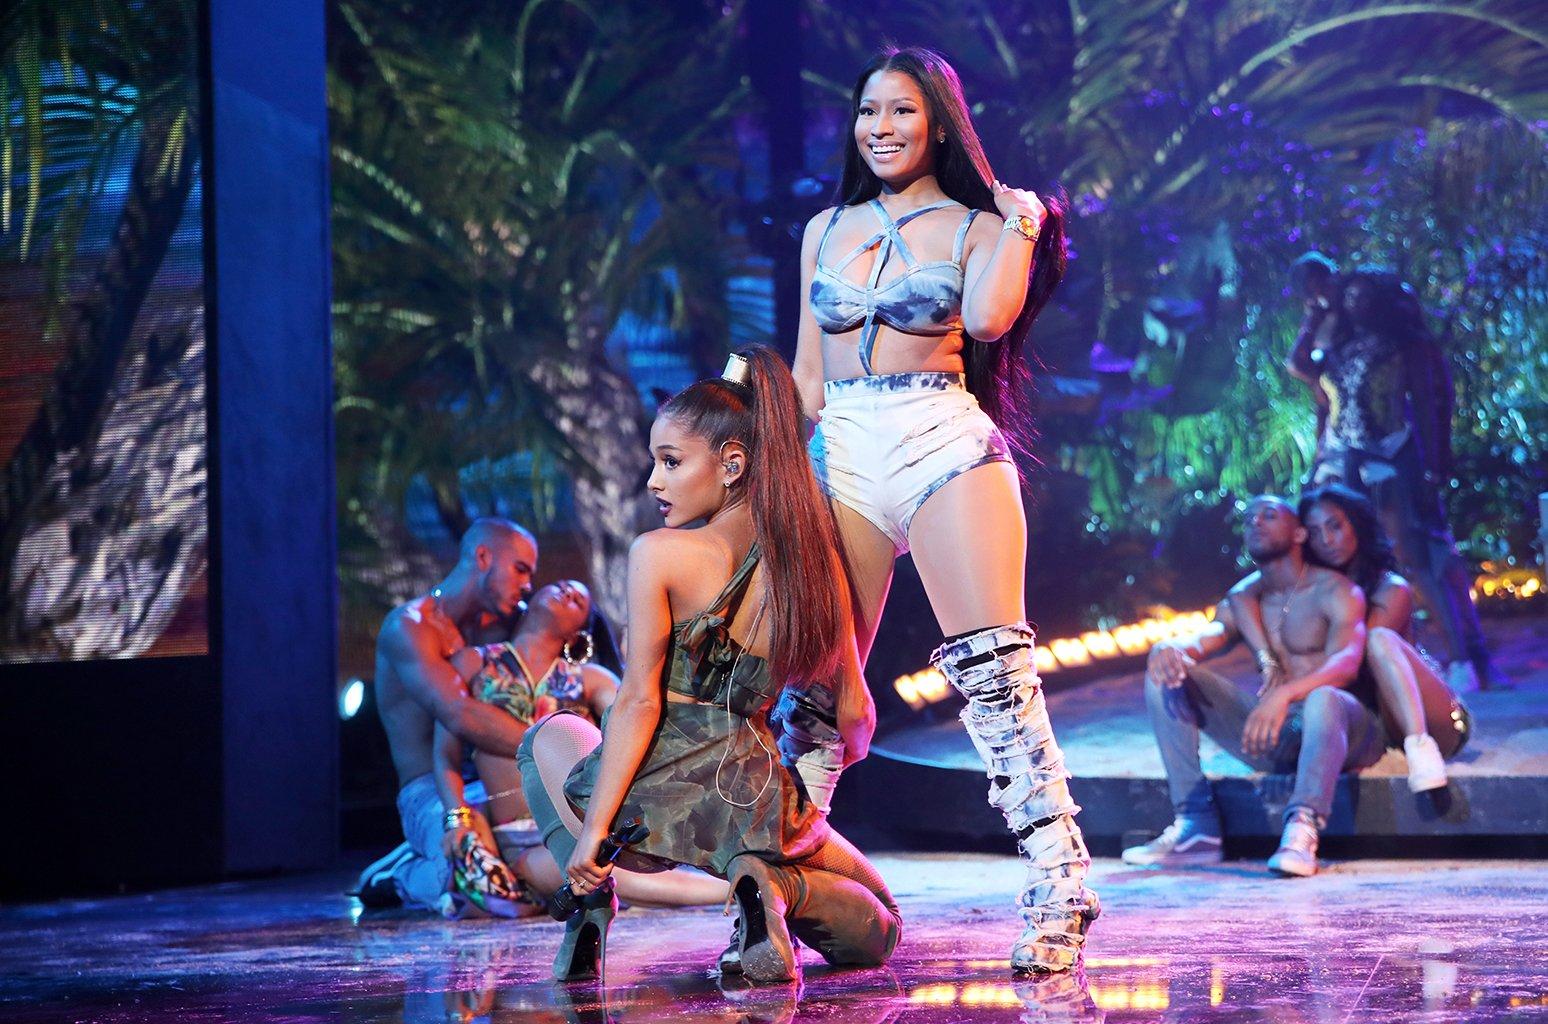 Nicki Minaj and Ariana Grande team up for sexy duet 'Bed' https://t.co/HDKM4HuLEm https://t.co/pErLdZeuyC